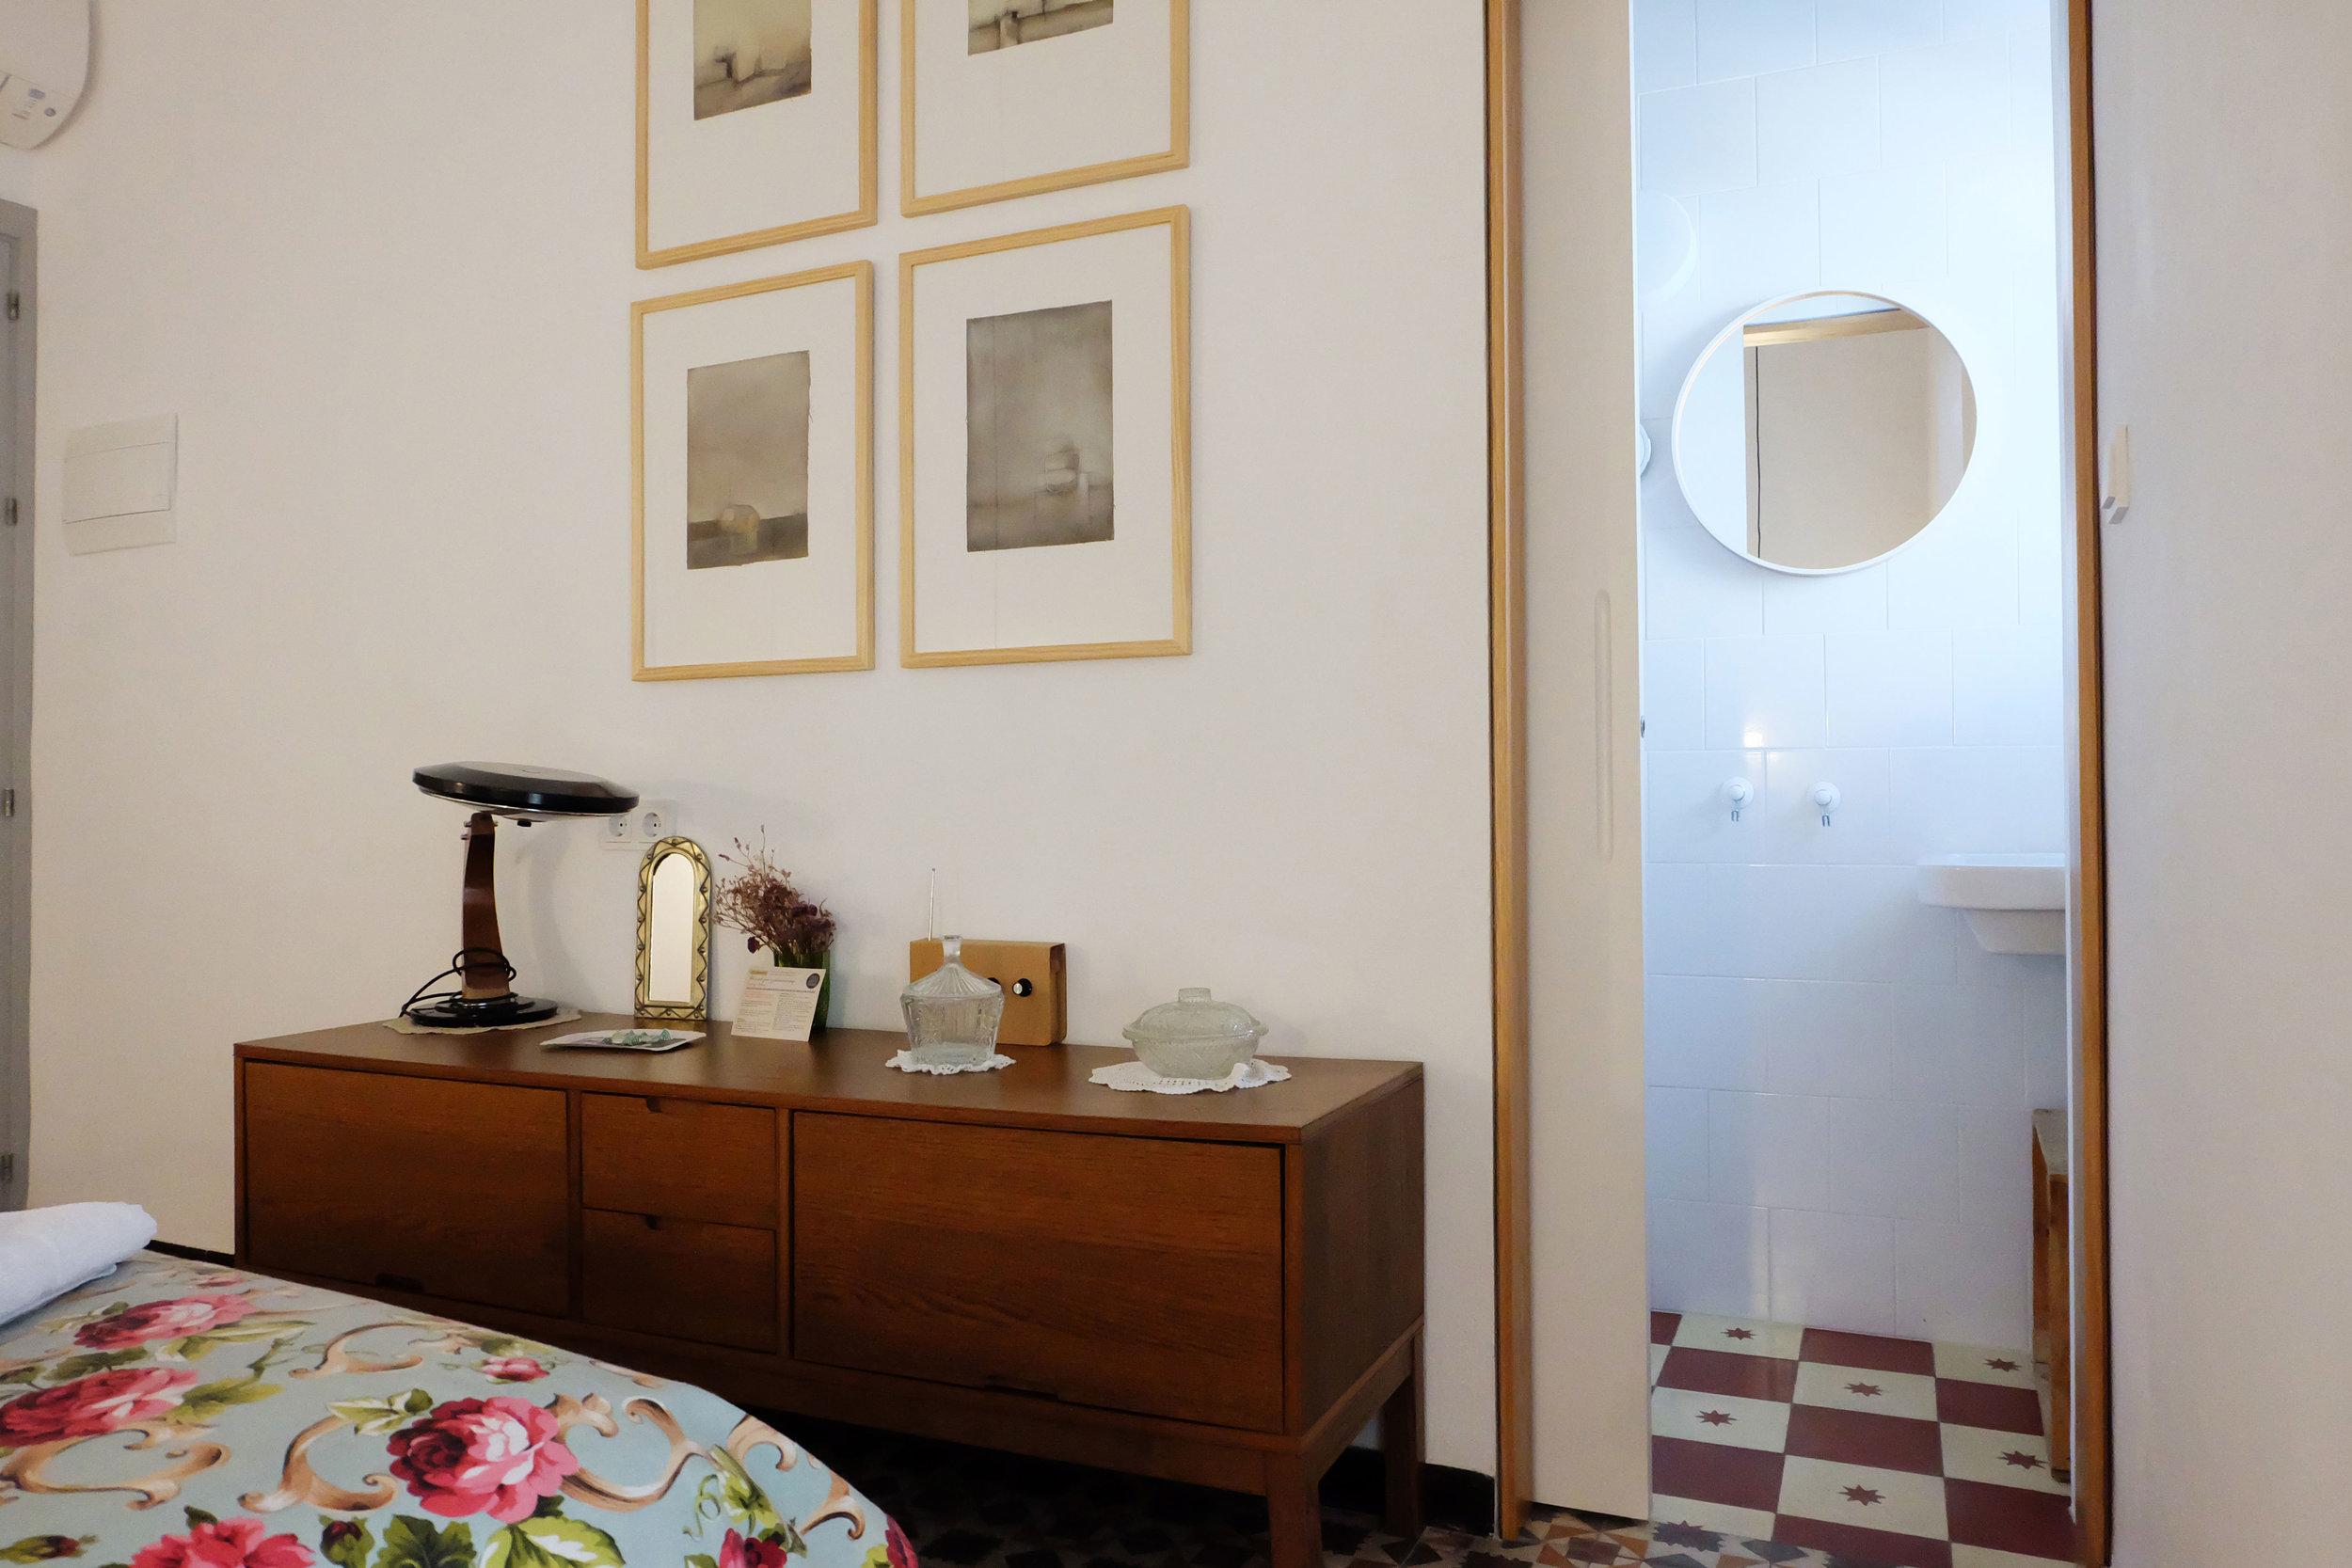 Hotel-Casa-de-huespedes-santa-maria-Habitacion-7-17.jpg